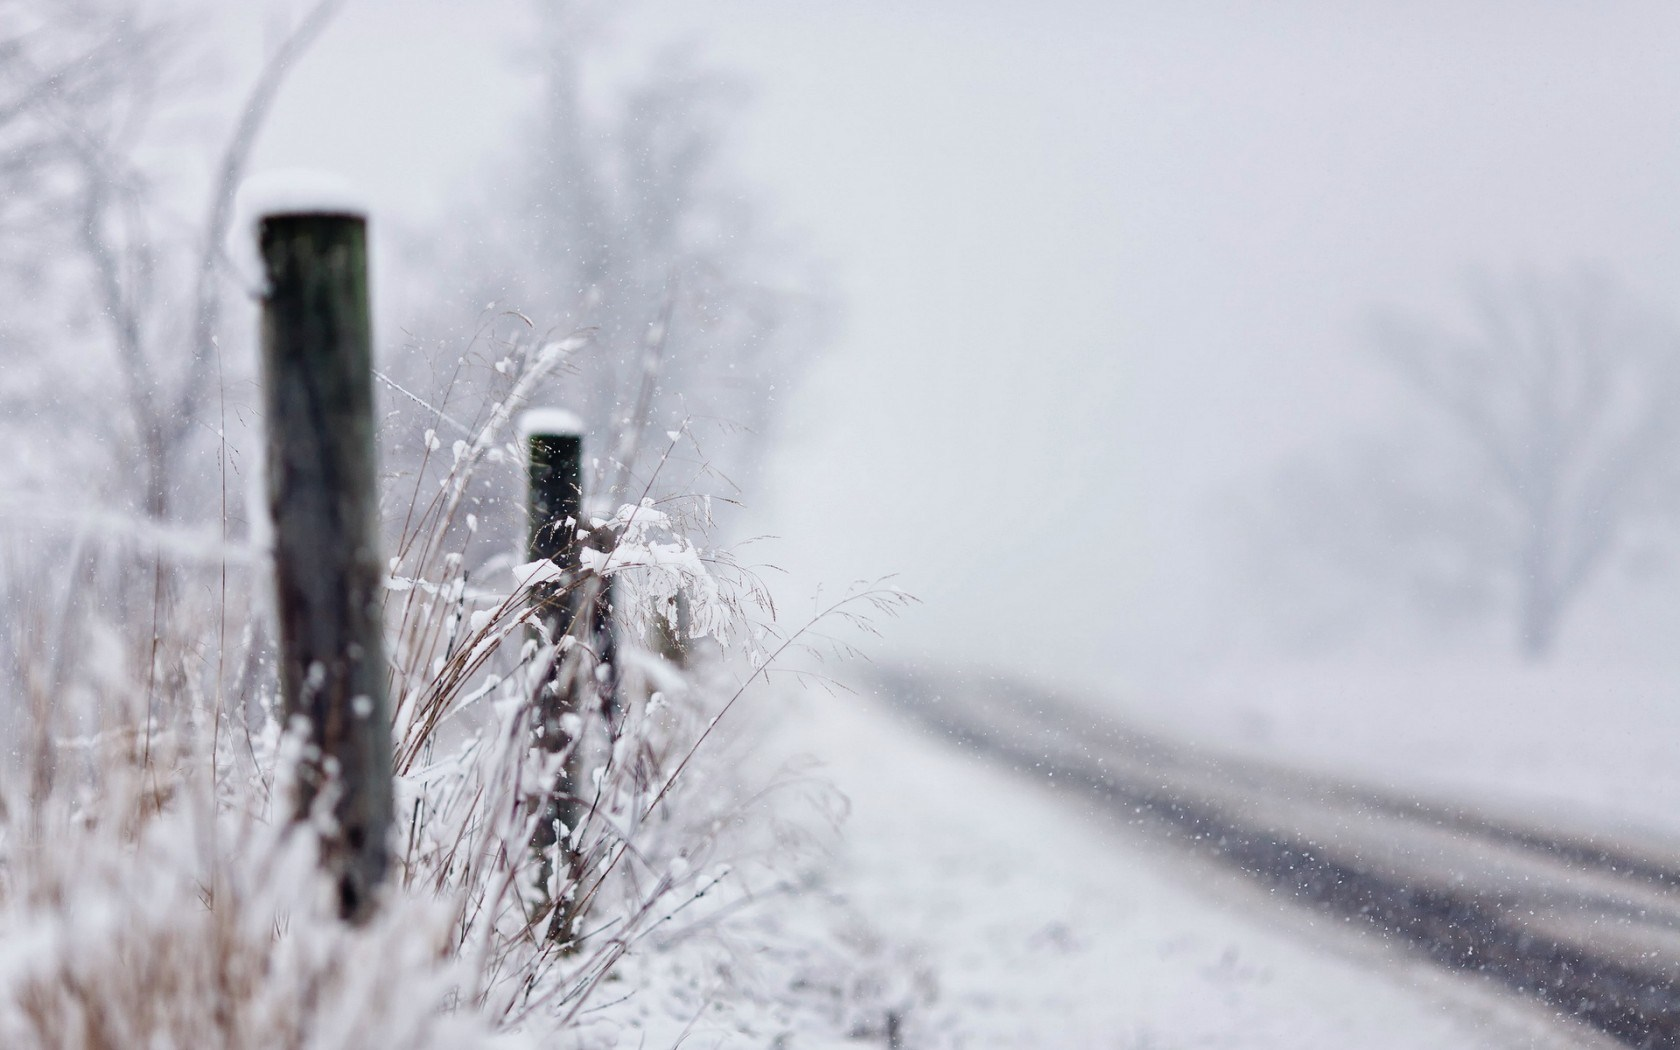 Snow Fence Wallpaper HD